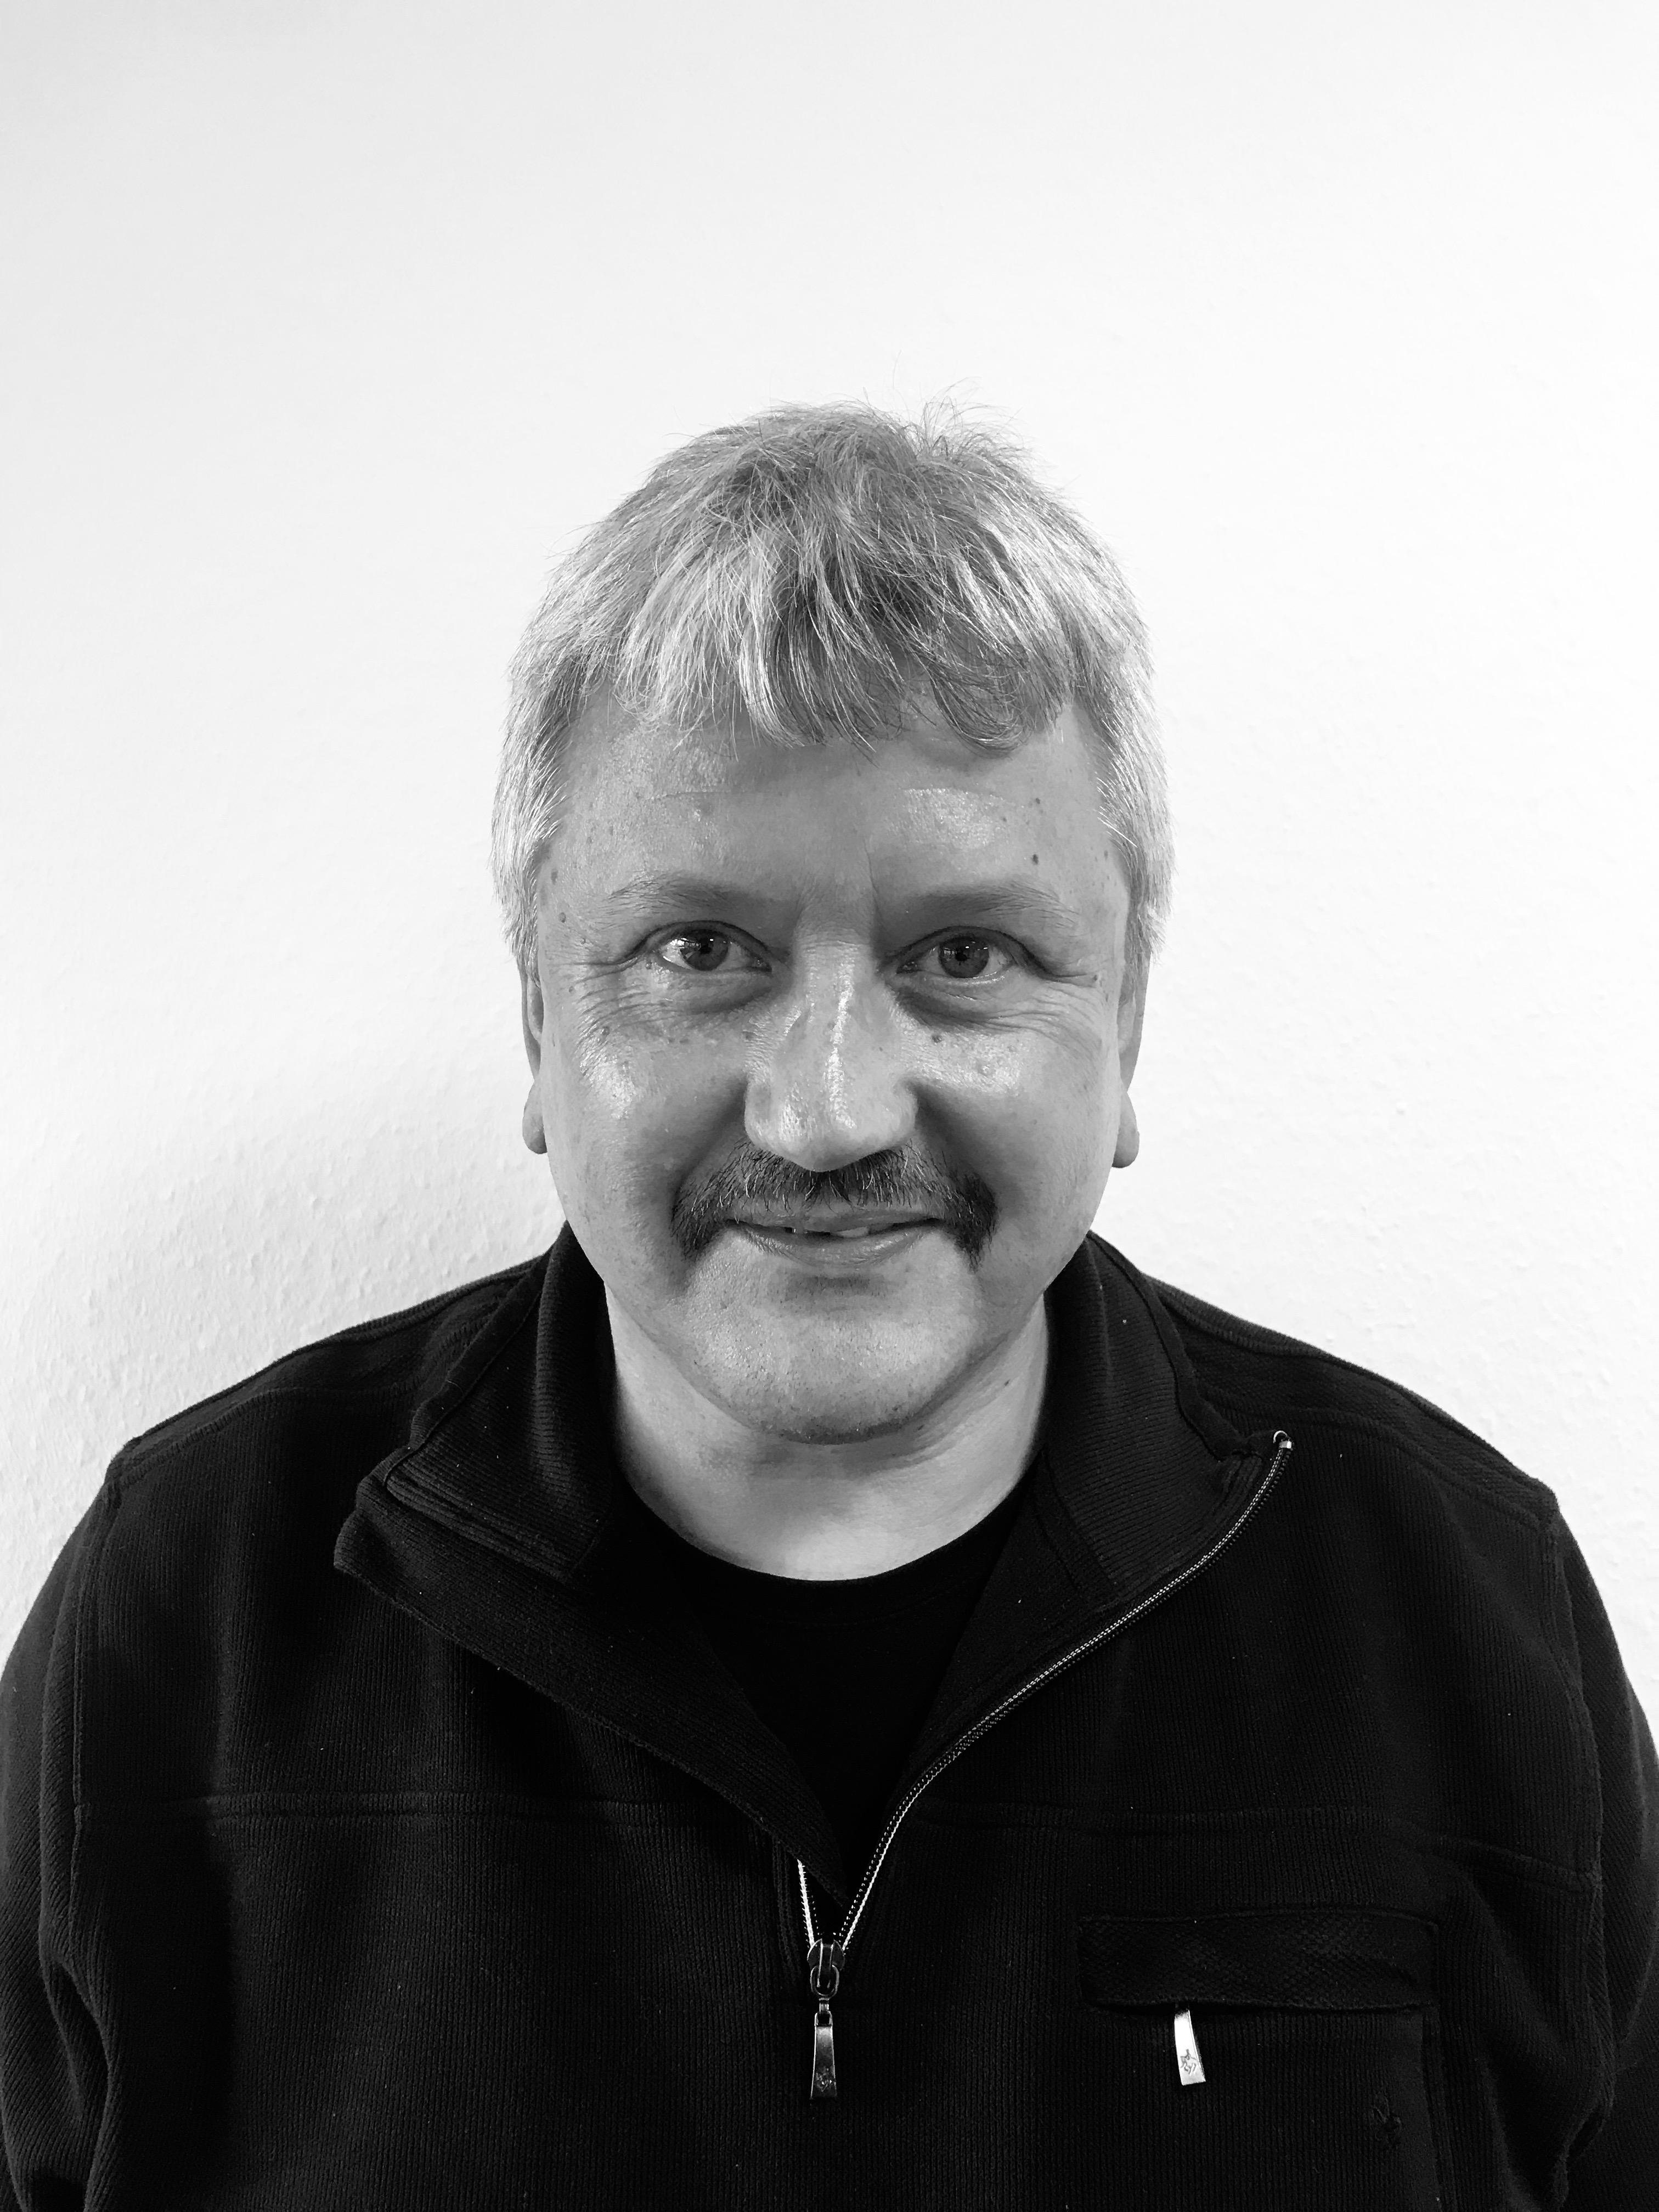 Kim Sau Johansen